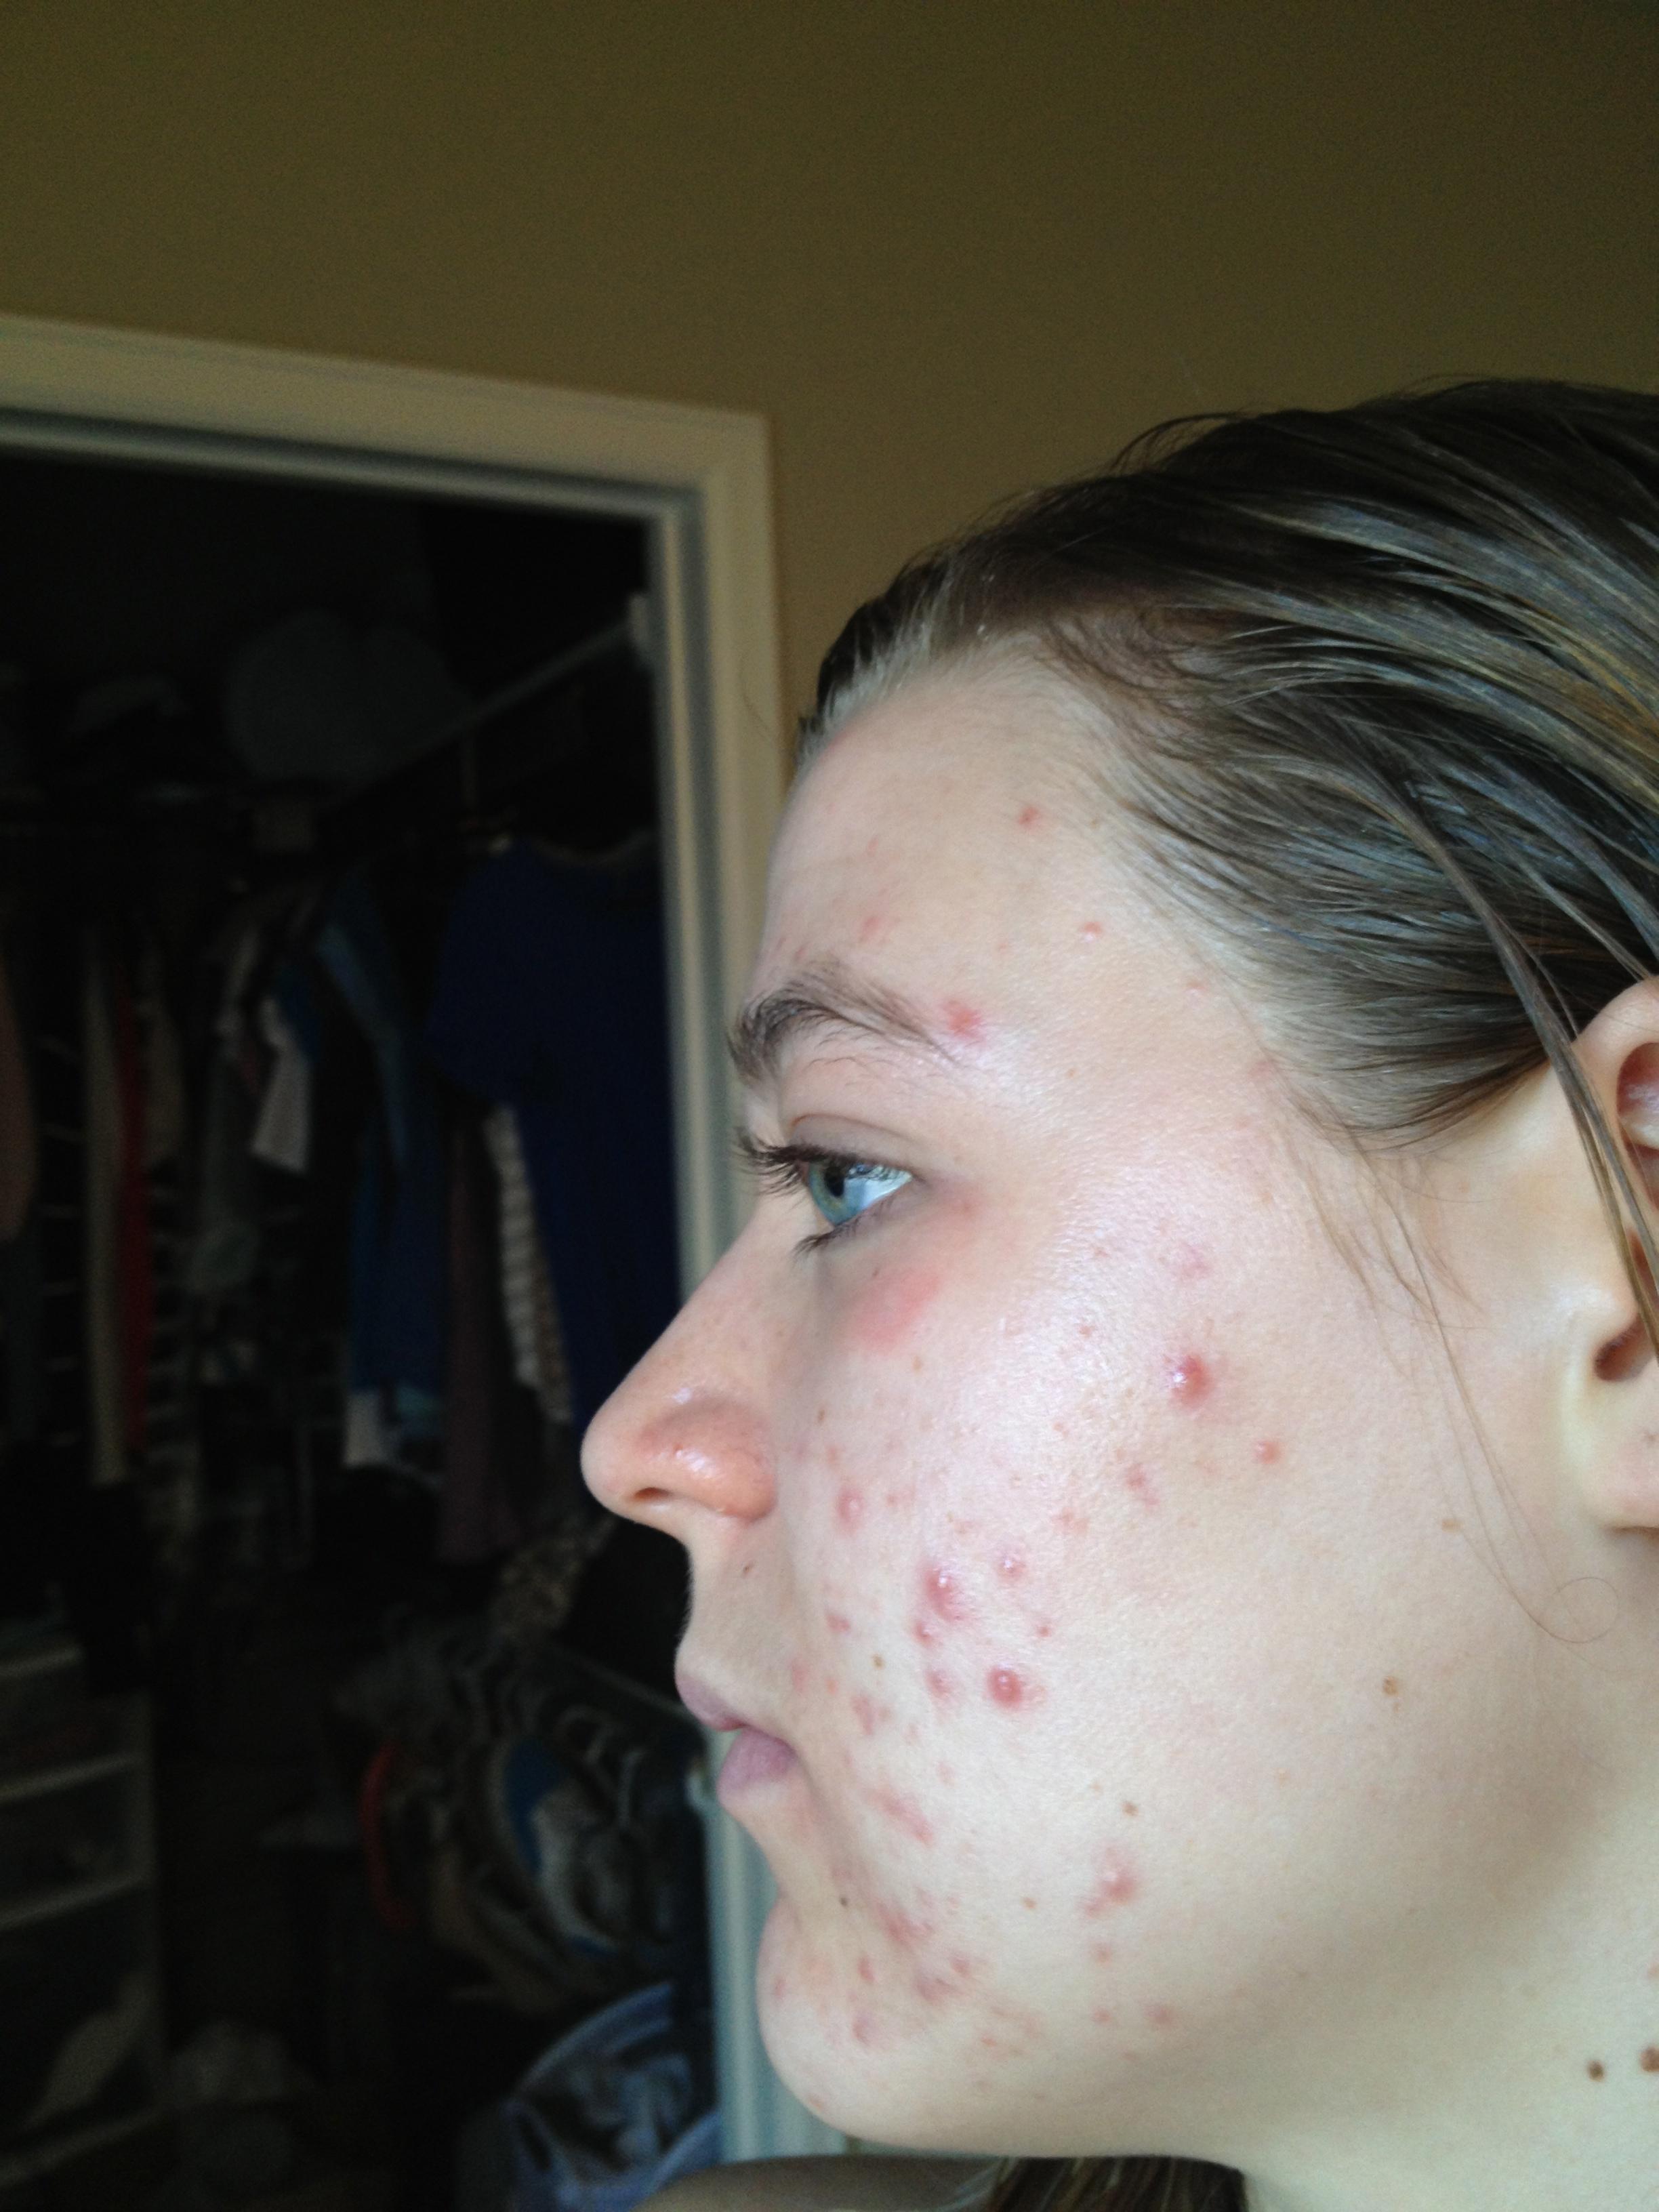 left side: my acne at it'sworst (April 2013)